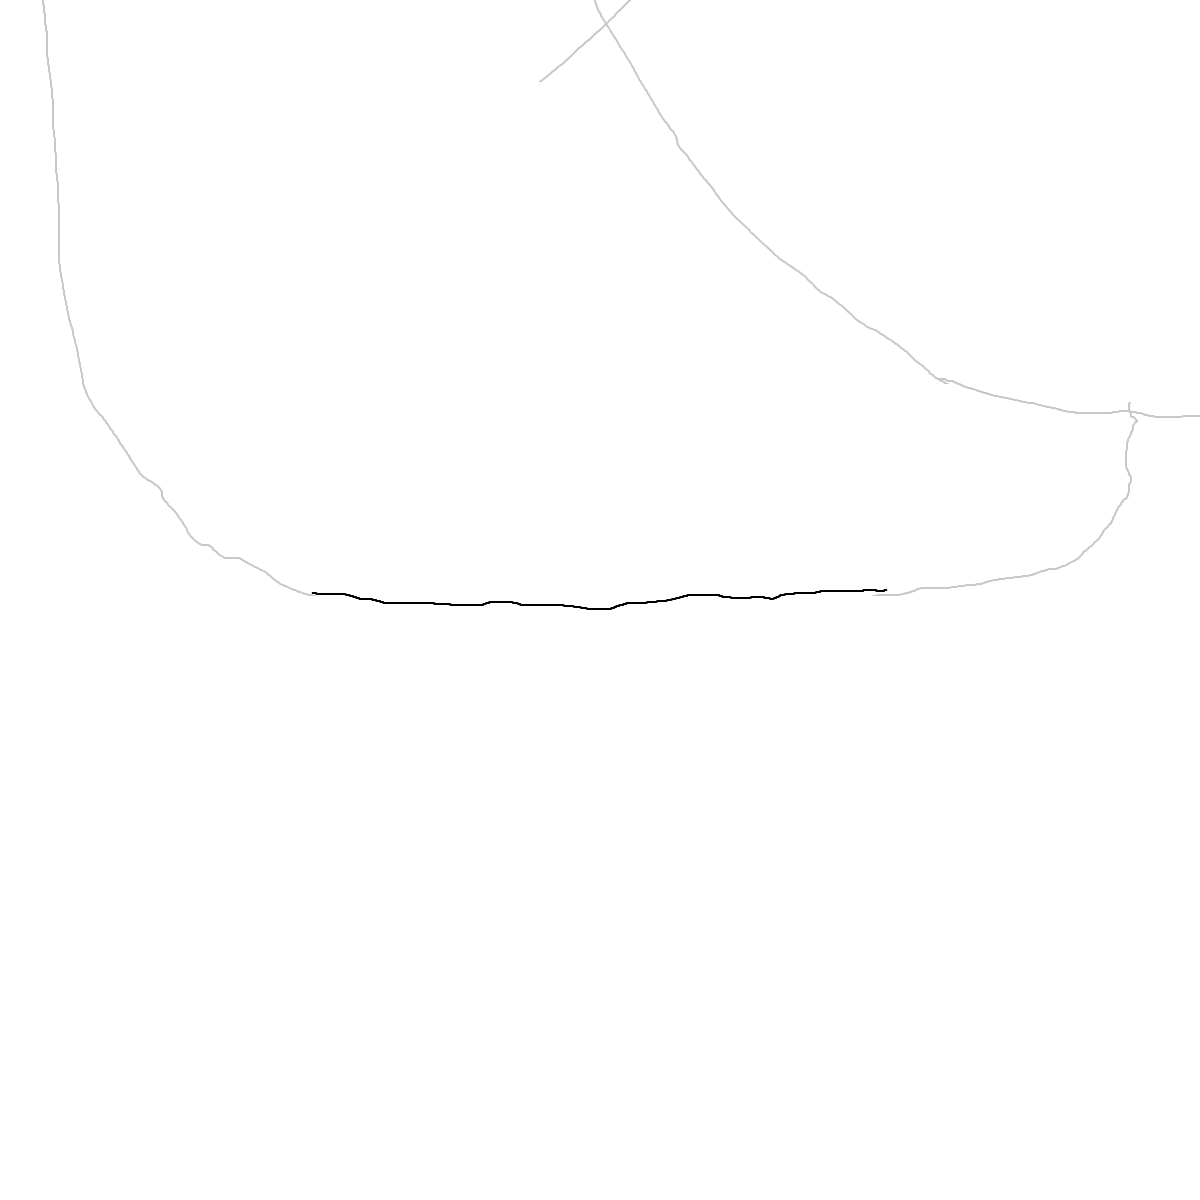 BAAAM drawing#16084 lat:39.0970993041992200lng: -84.5064392089843800